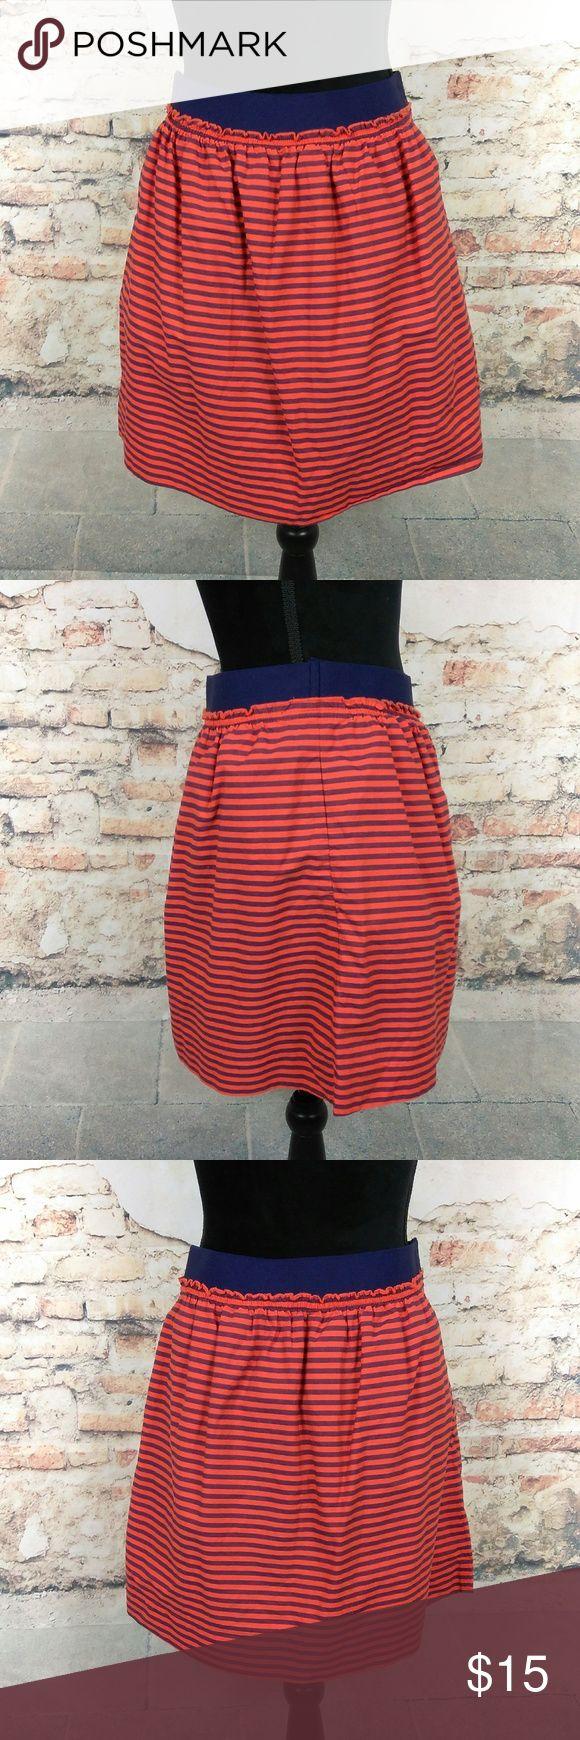 J. Crew 2 Orange Blue Striped Market Mini Skirt J. Crew Wms Sz 2 Orange Blue Striped Market Mini Skirt 100% Cotton w/ POCKETS J. Crew Skirts Mini